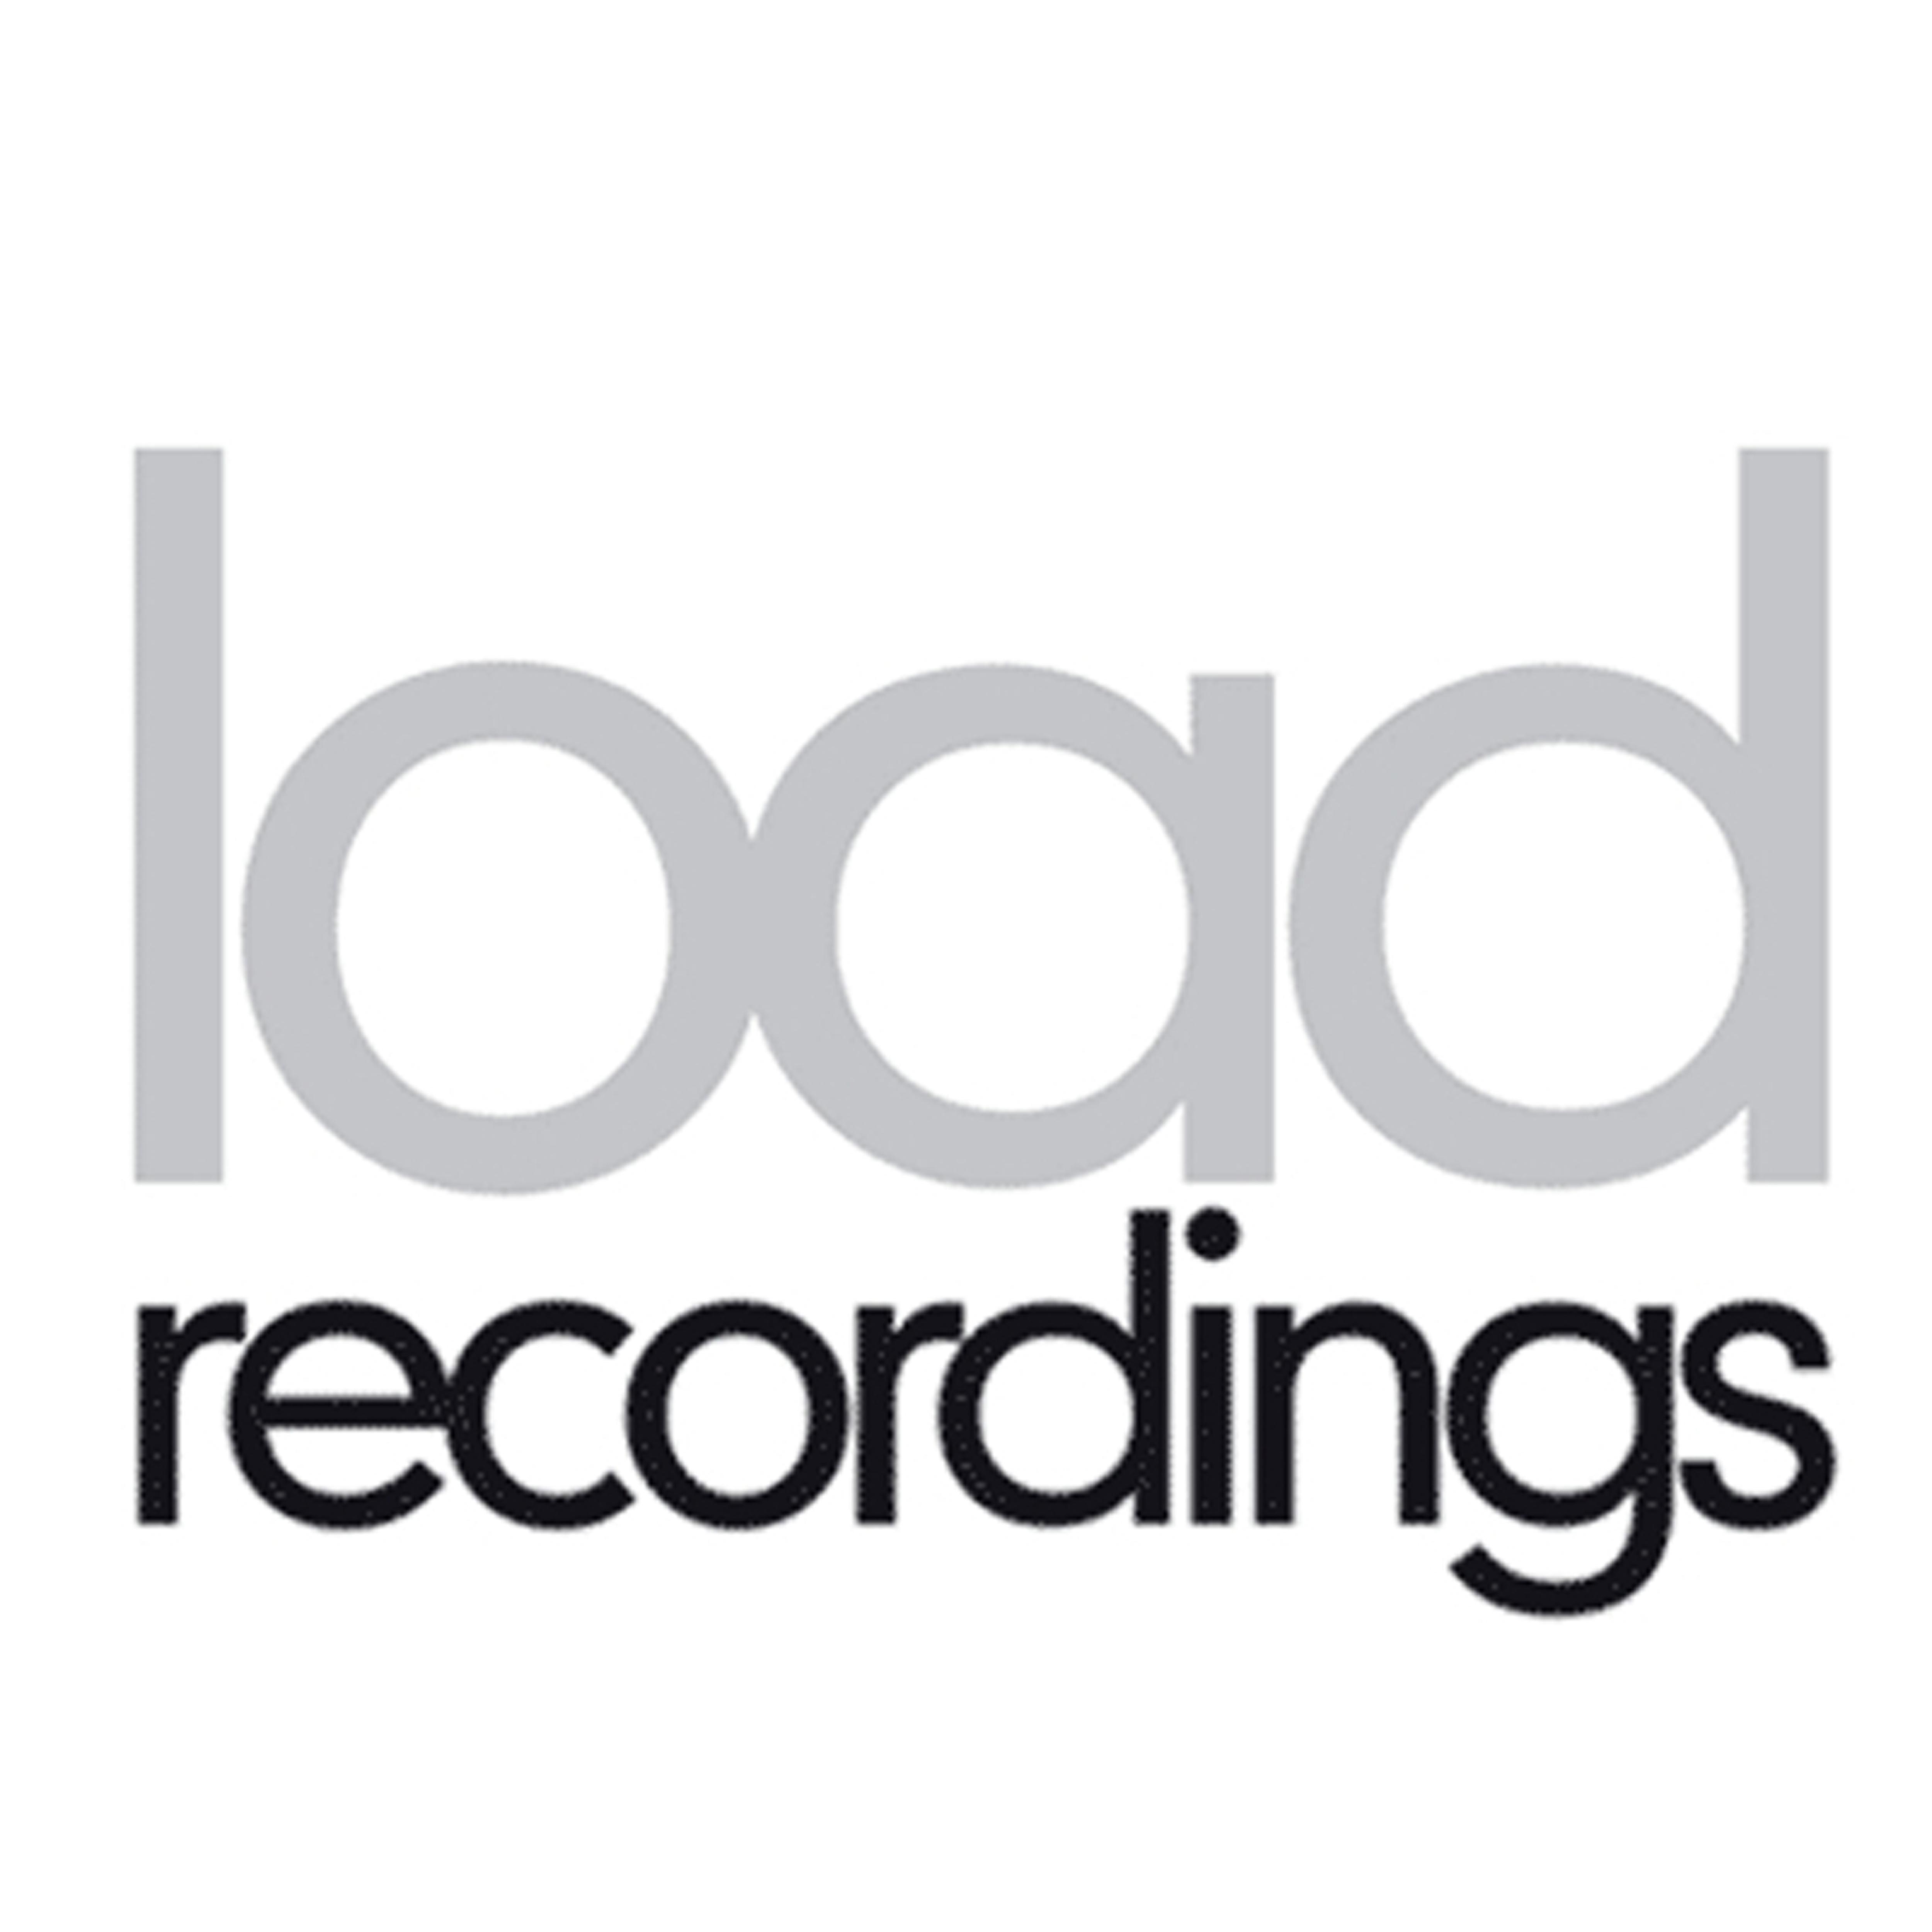 Load Recordings